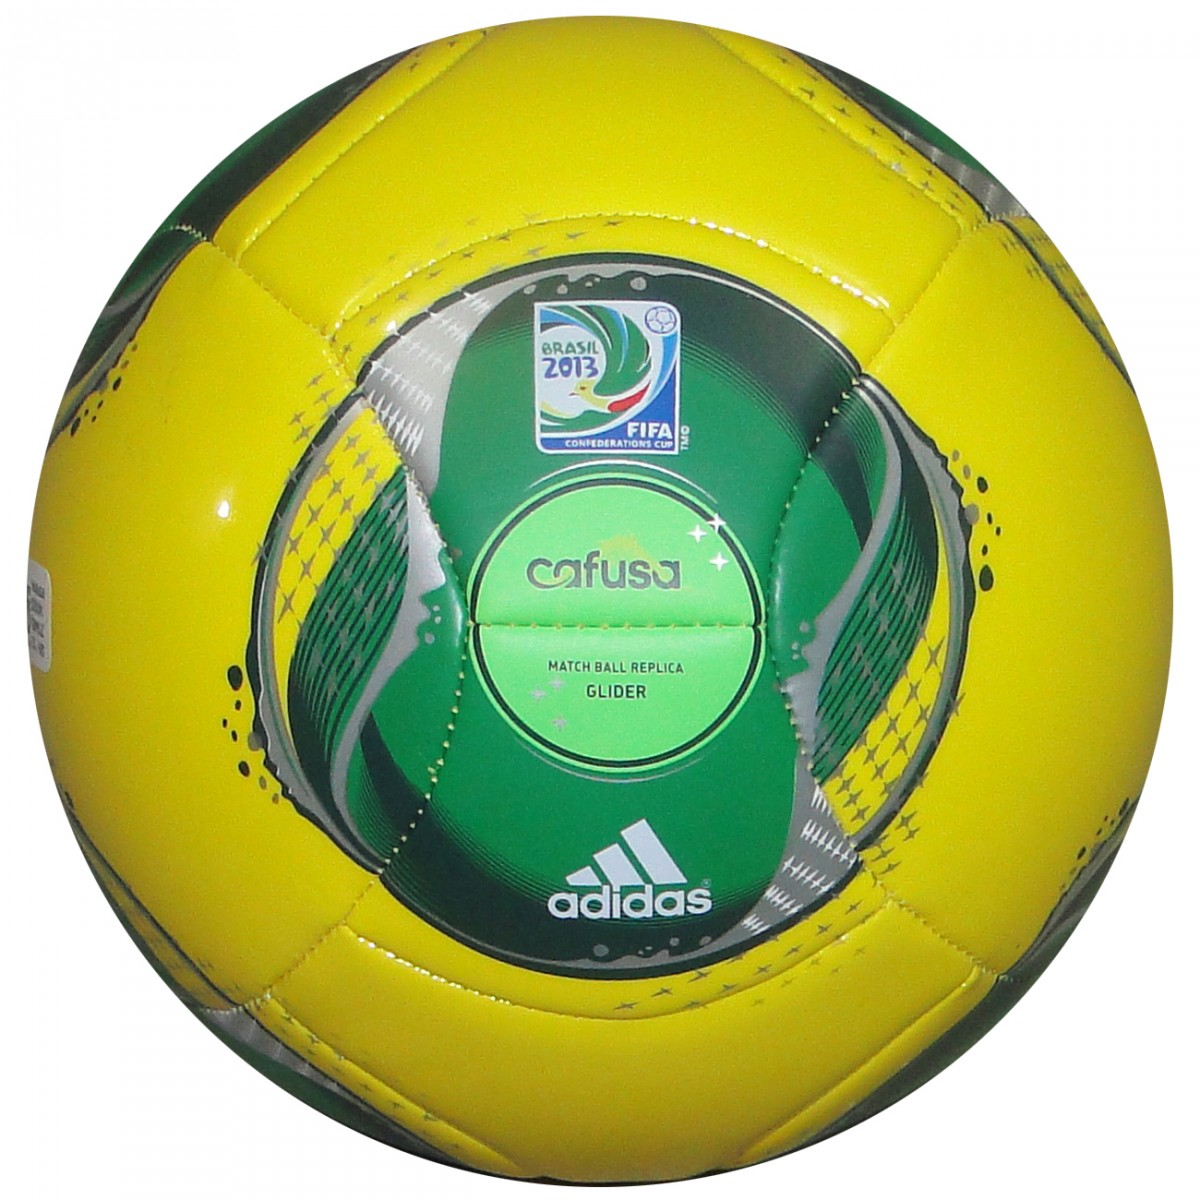 ff6fbee3427c3 Bola Adidas Cafusa Confed. 2013 Z19465 - Amarelo Verde - Chuteira Nike